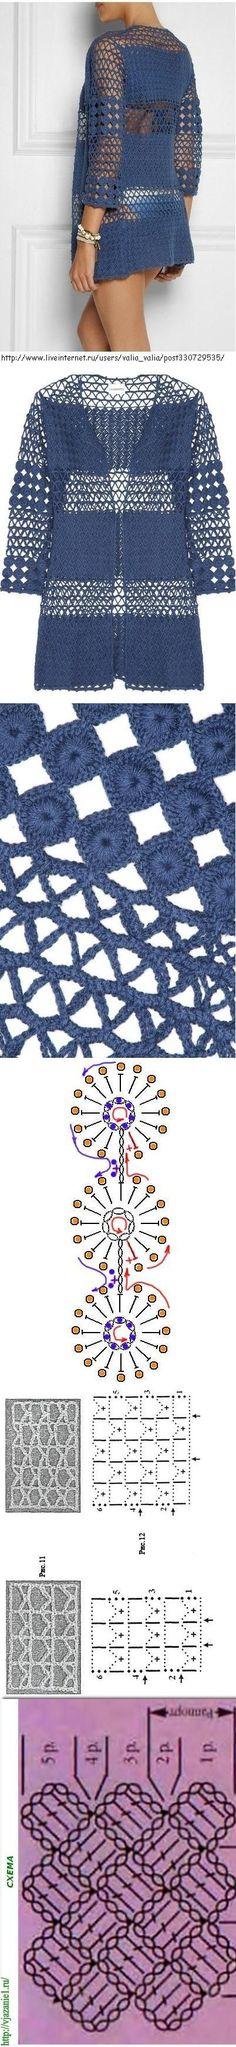 19 trendy ideas for crochet top diagram tags Gilet Crochet, Crochet Coat, Crochet Motifs, Crochet Jacket, Crochet Cardigan, Crochet Clothes, Crochet Stitches, Crochet Patterns, Cardigan Azul